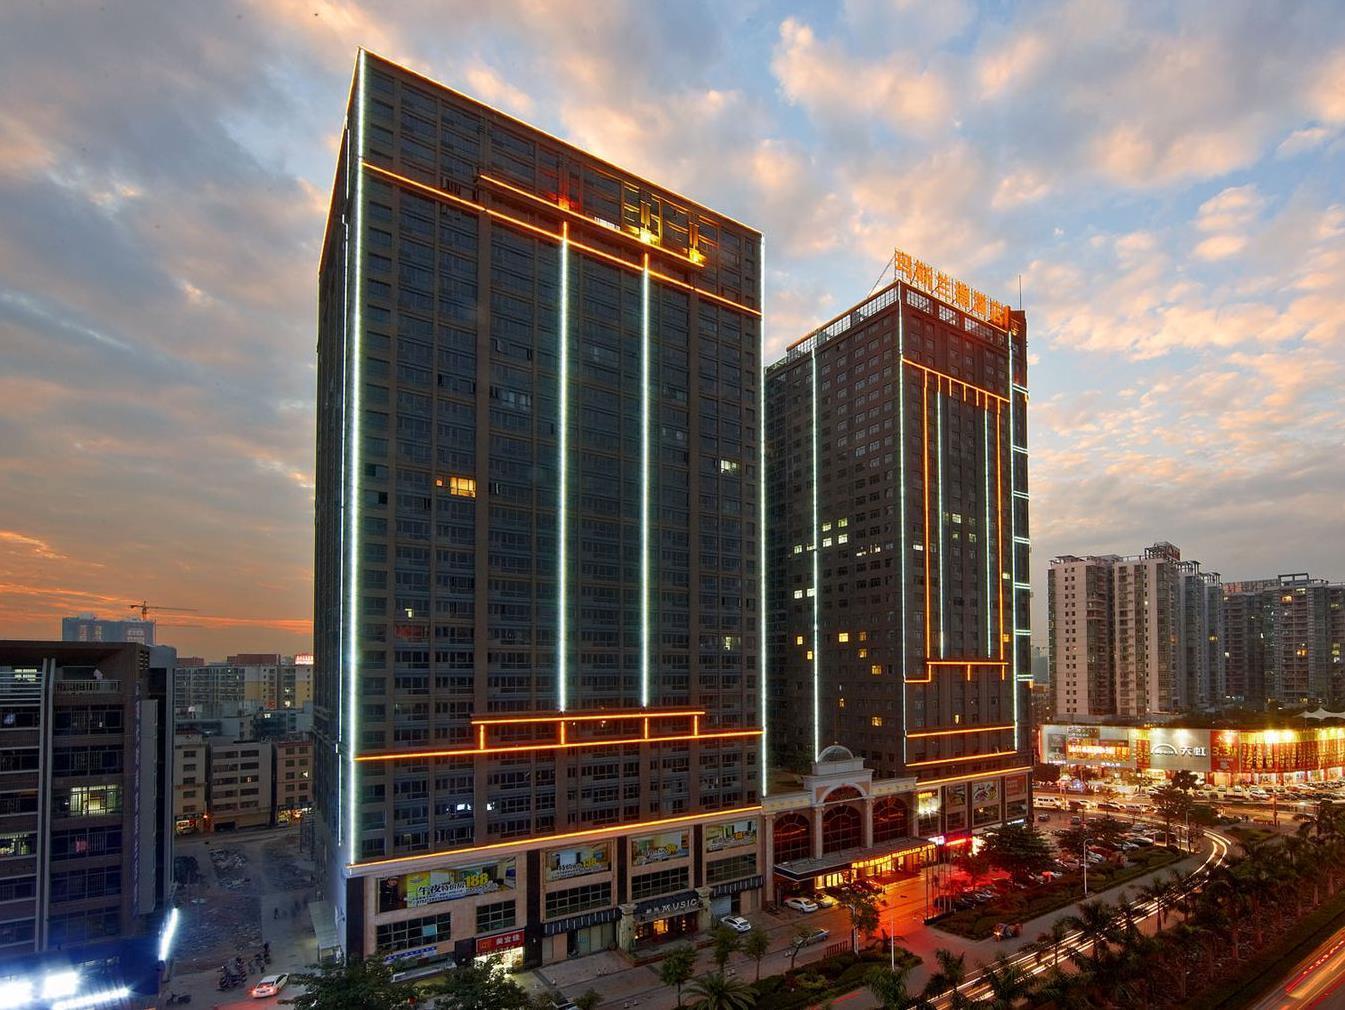 Ane Courtyard Hotel Yibin Branch Hotels In Huizhou China Book Hotels And Cheap Accommodation